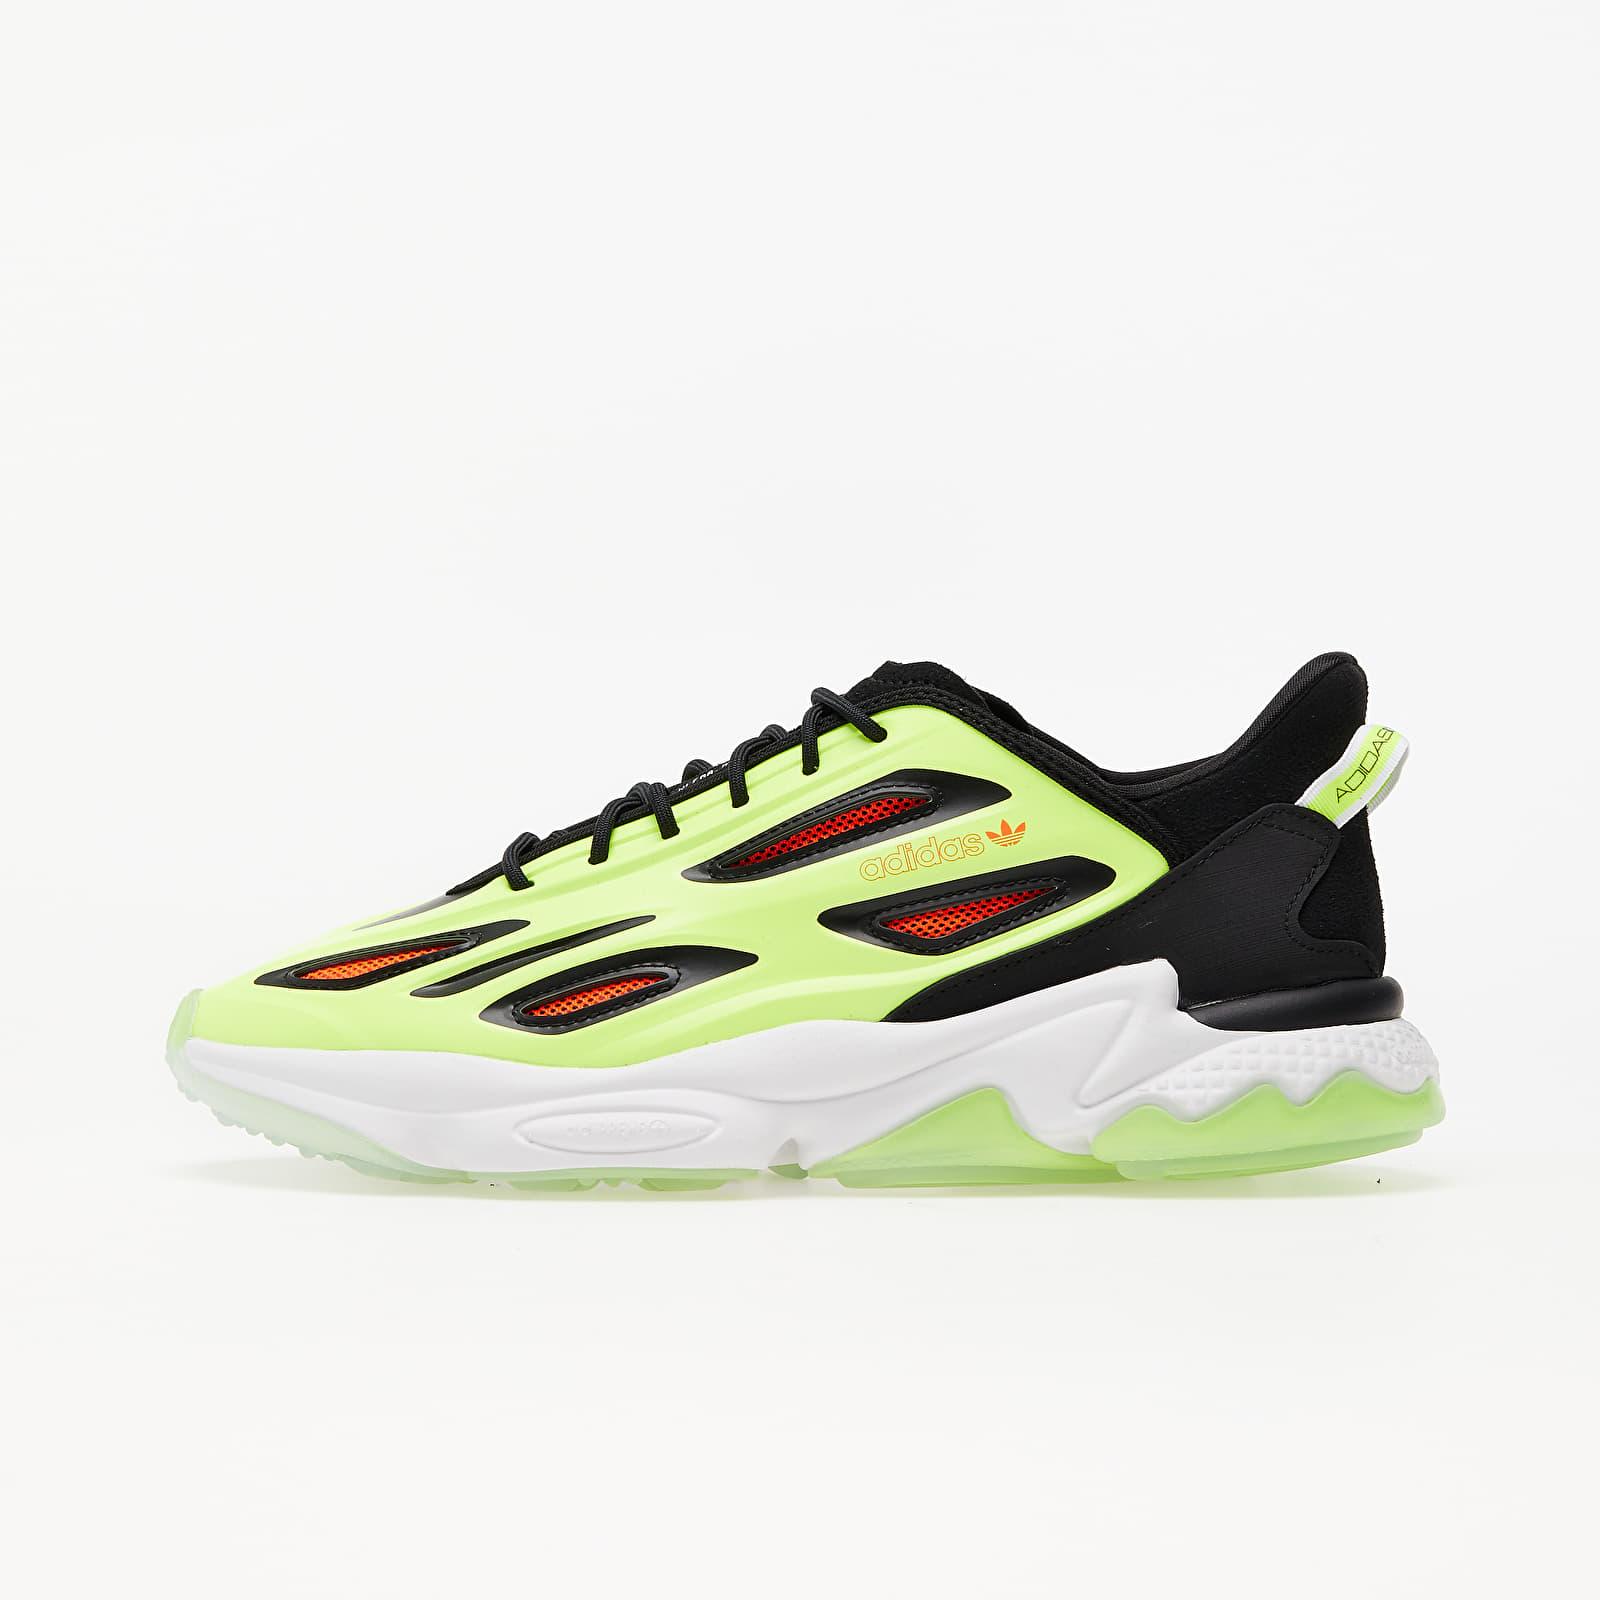 adidas Ozweego Celox Core Black/ Solar Yellow/ Solar Red H68622